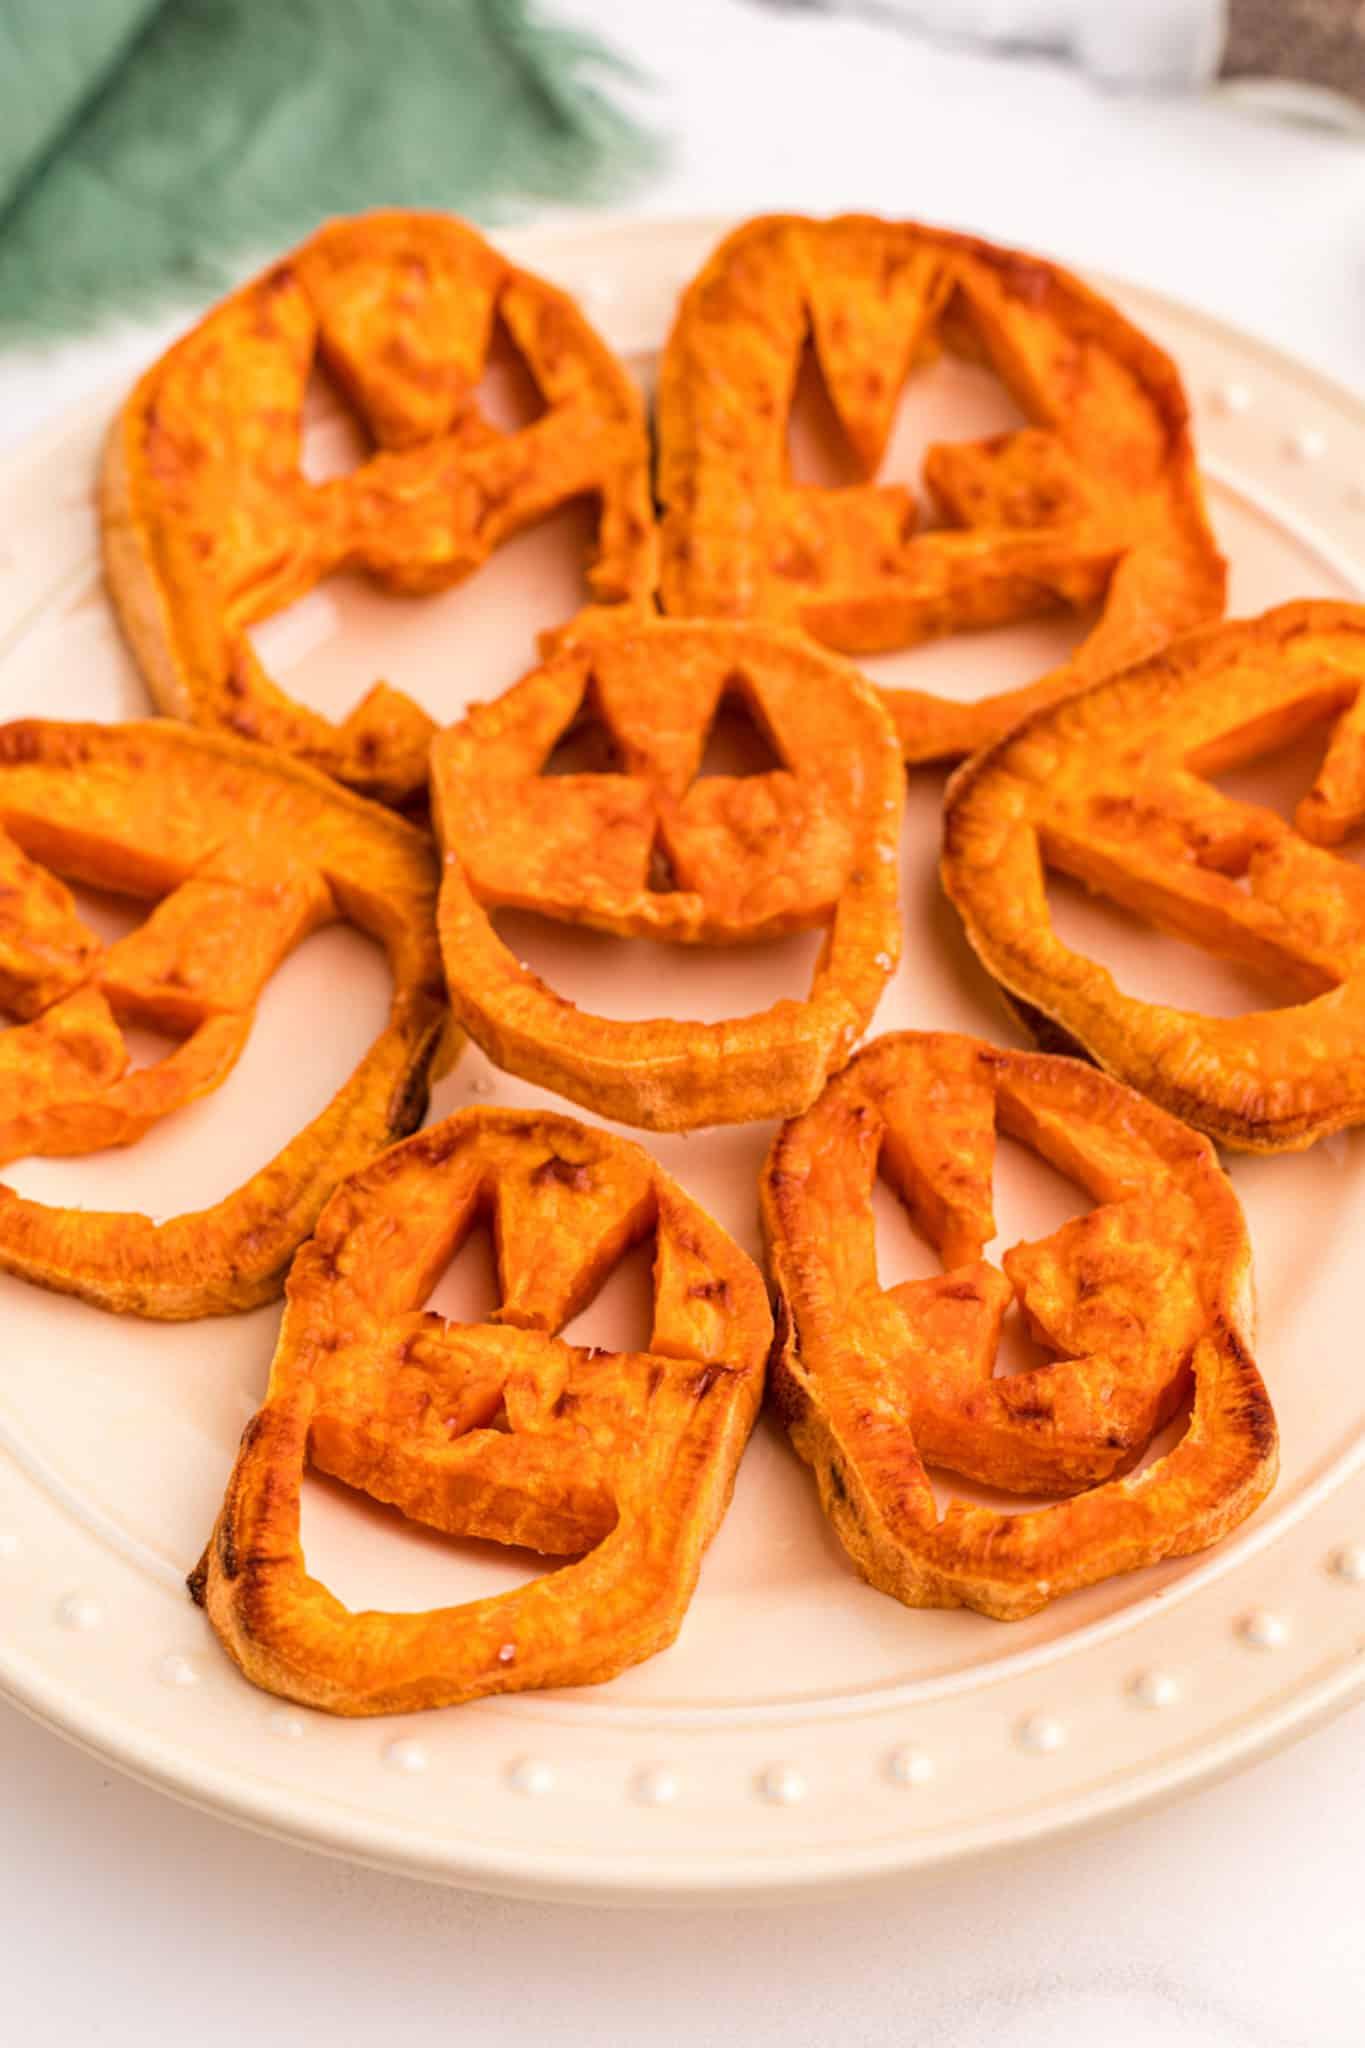 sweet potato jack o'lanterns on a plate